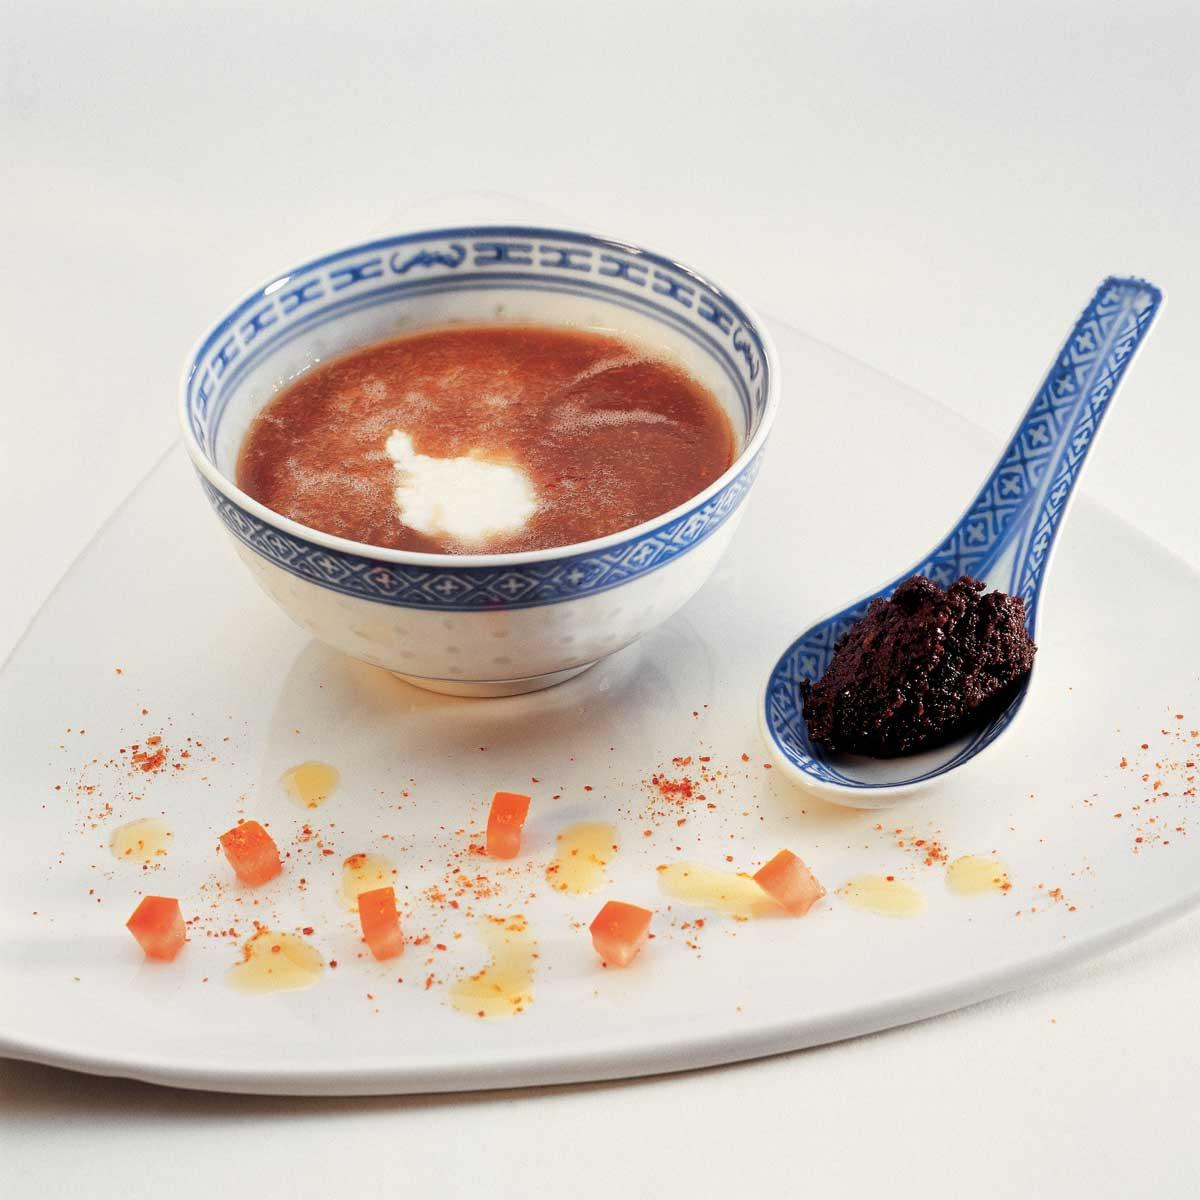 soupe de tomate froide au basilic une recette soupe cuisine le figaro madame. Black Bedroom Furniture Sets. Home Design Ideas